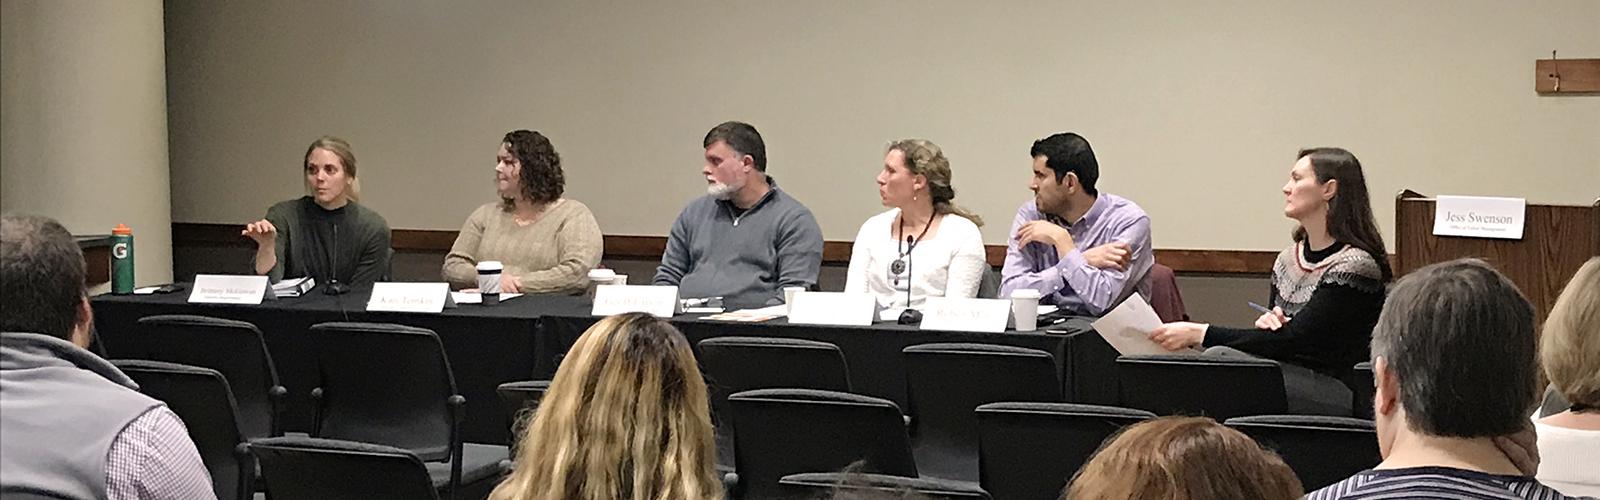 Leadership Panel session image